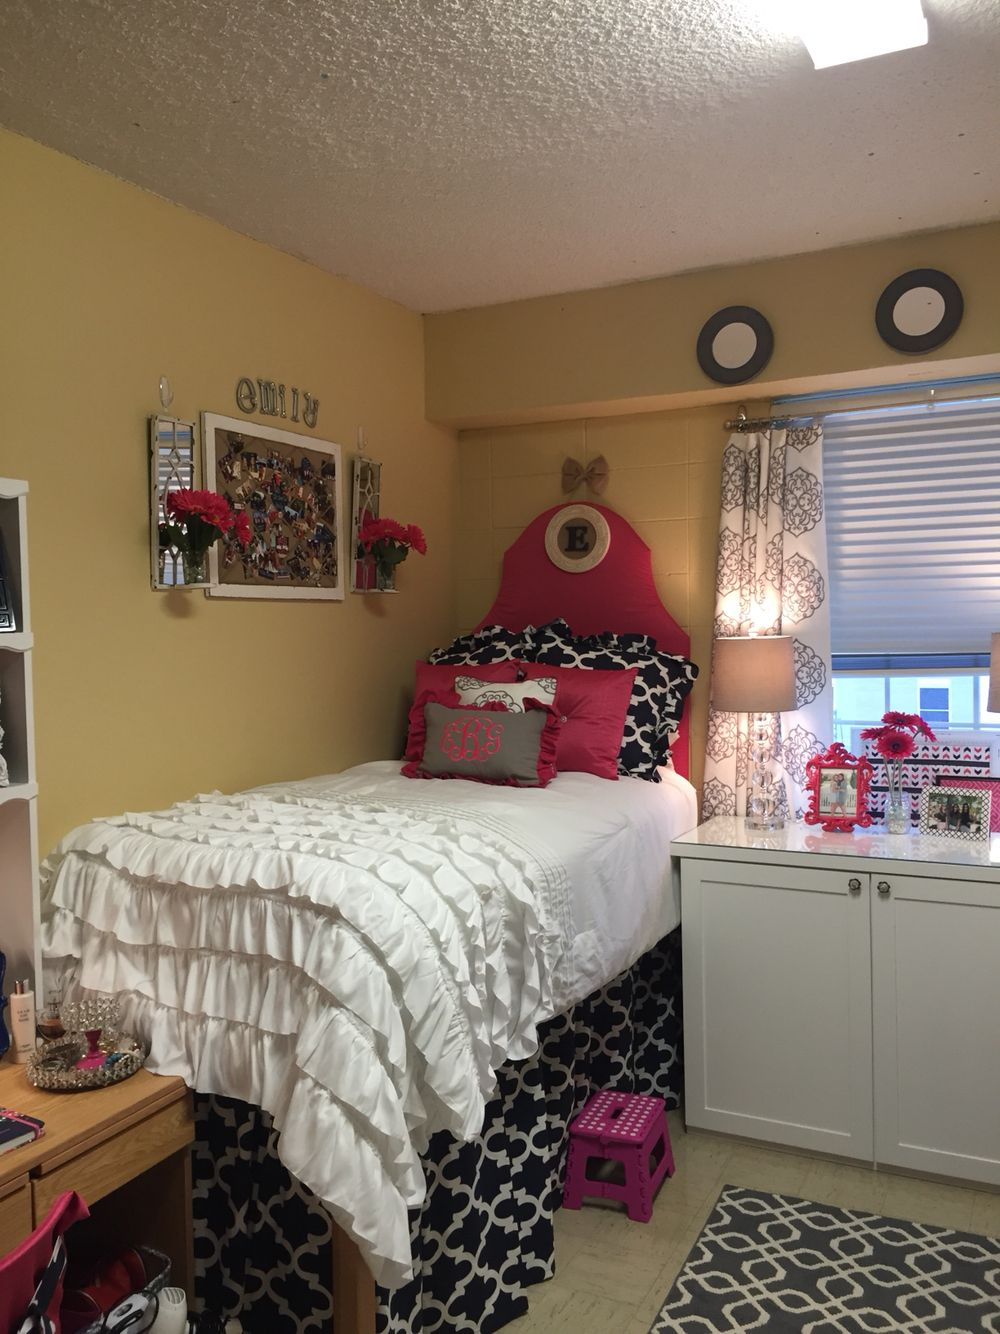 Dorm Room Furniture: Home Decor, Dorm Room, Furniture